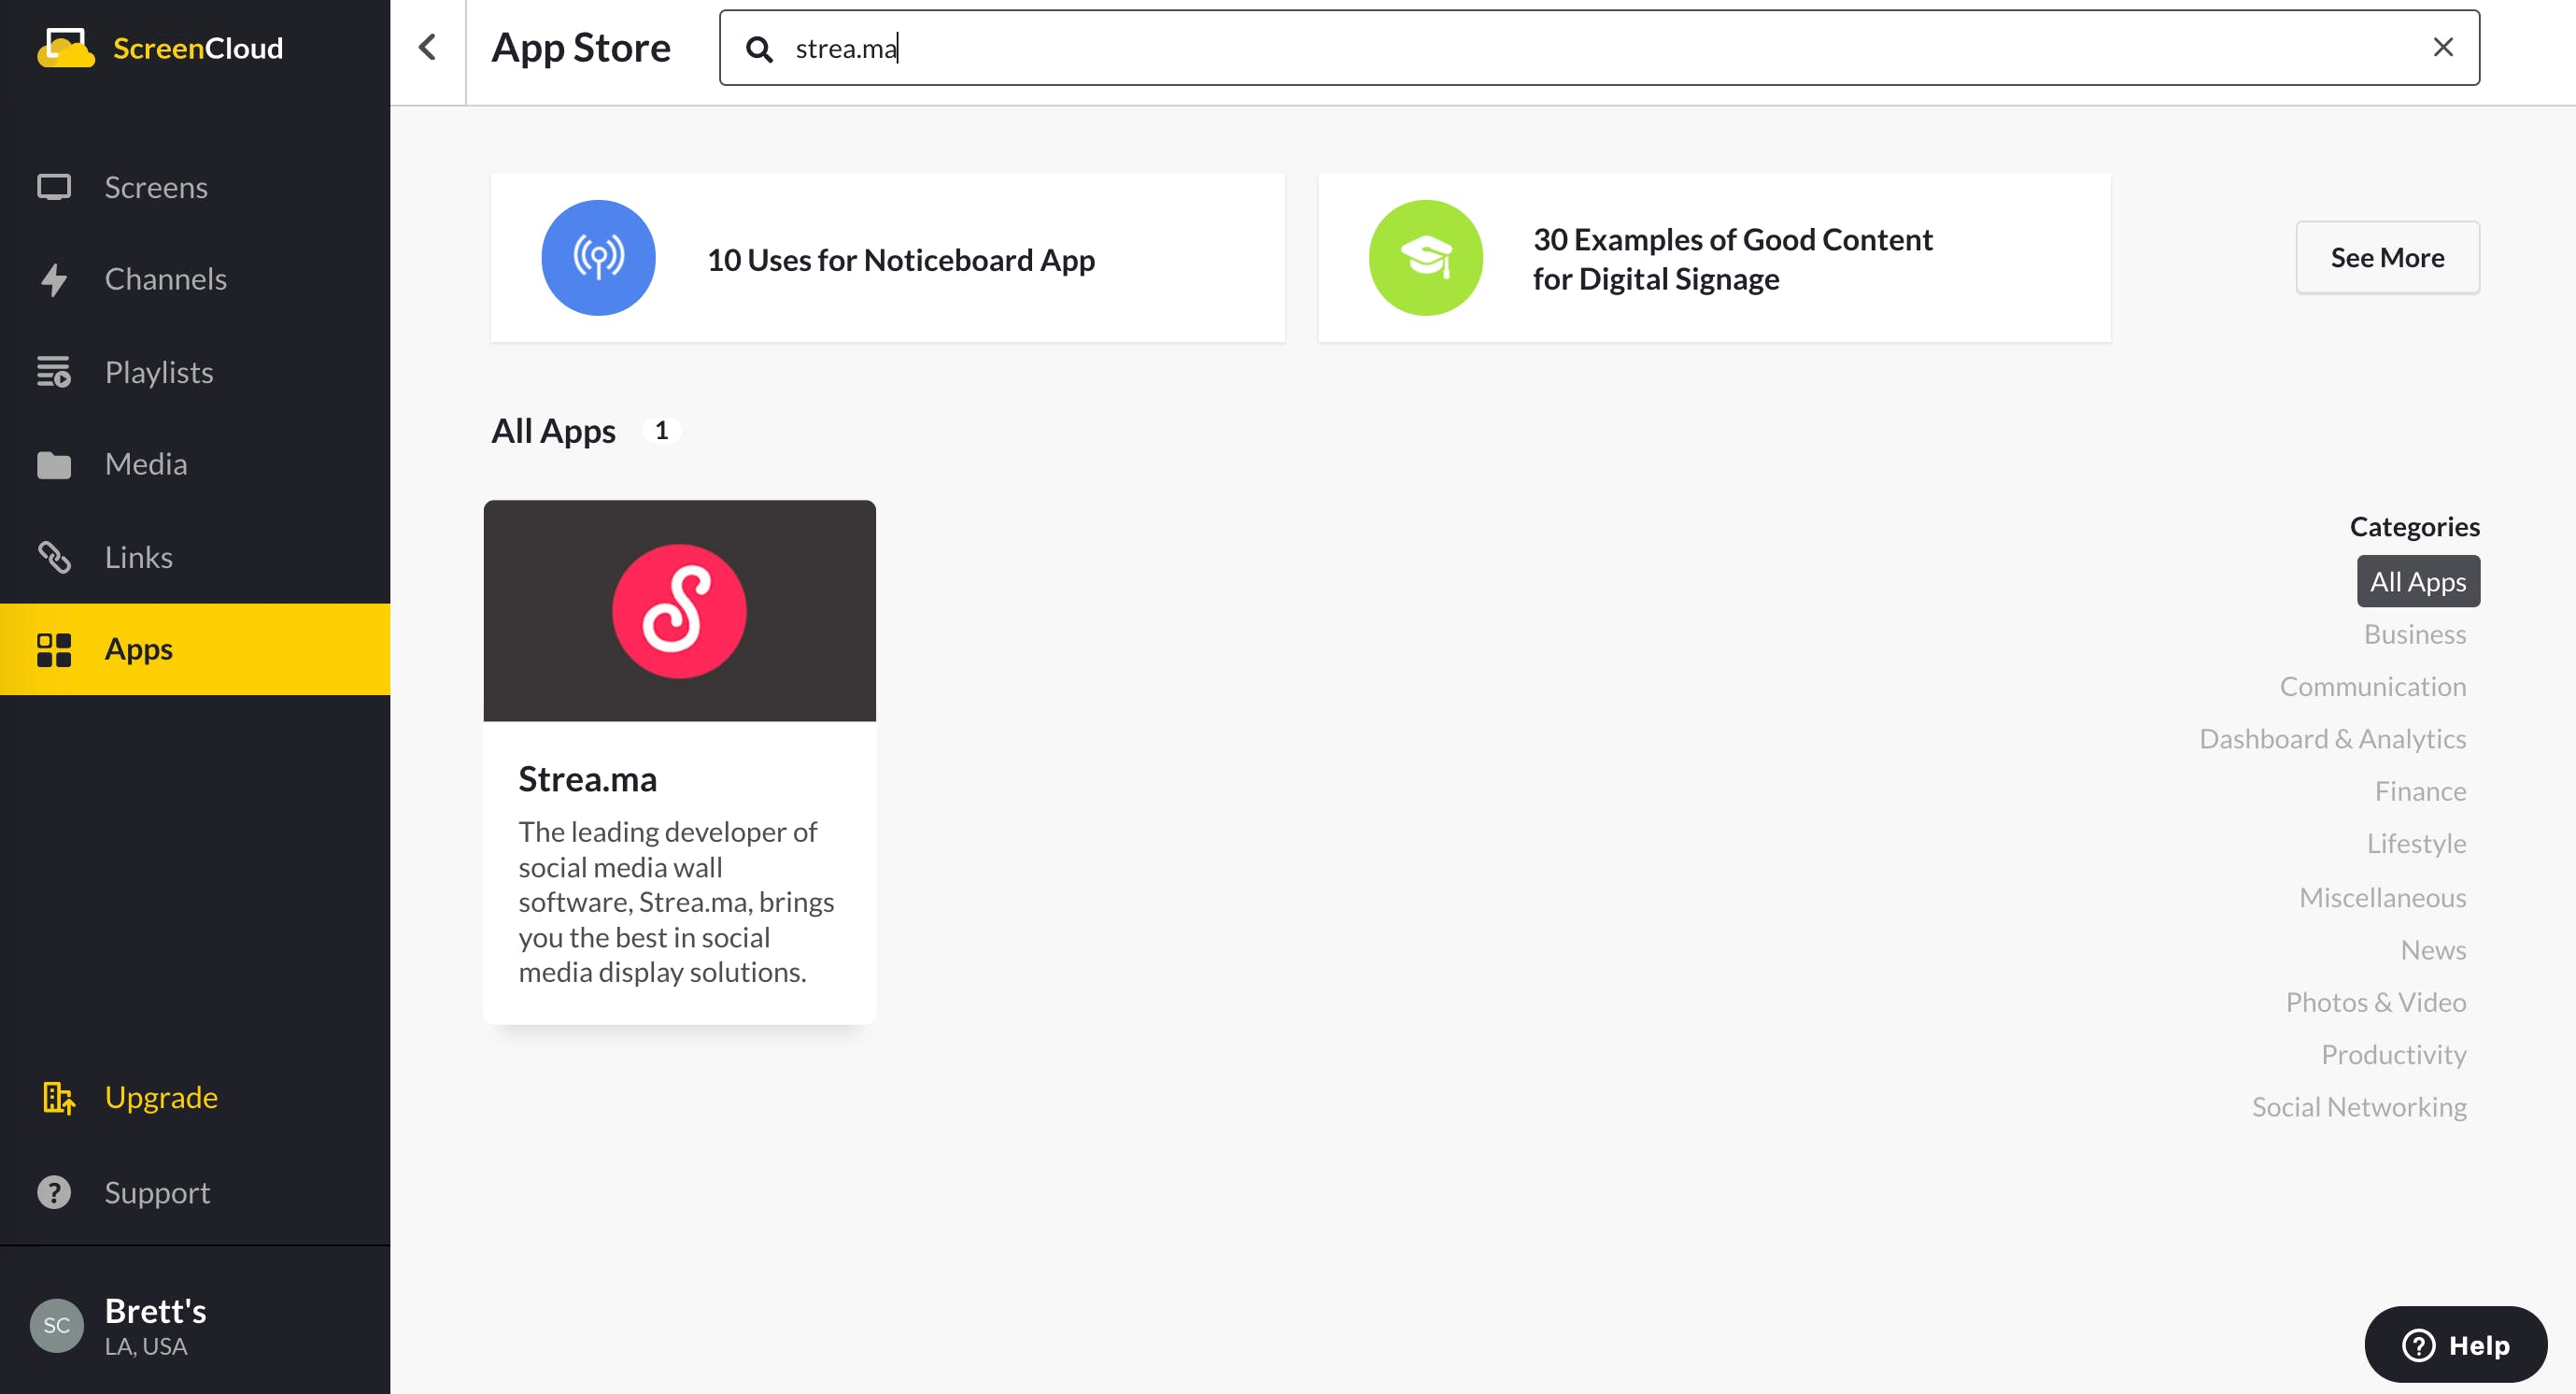 Strea.ma App Guide - App Store 5.14.2020.png